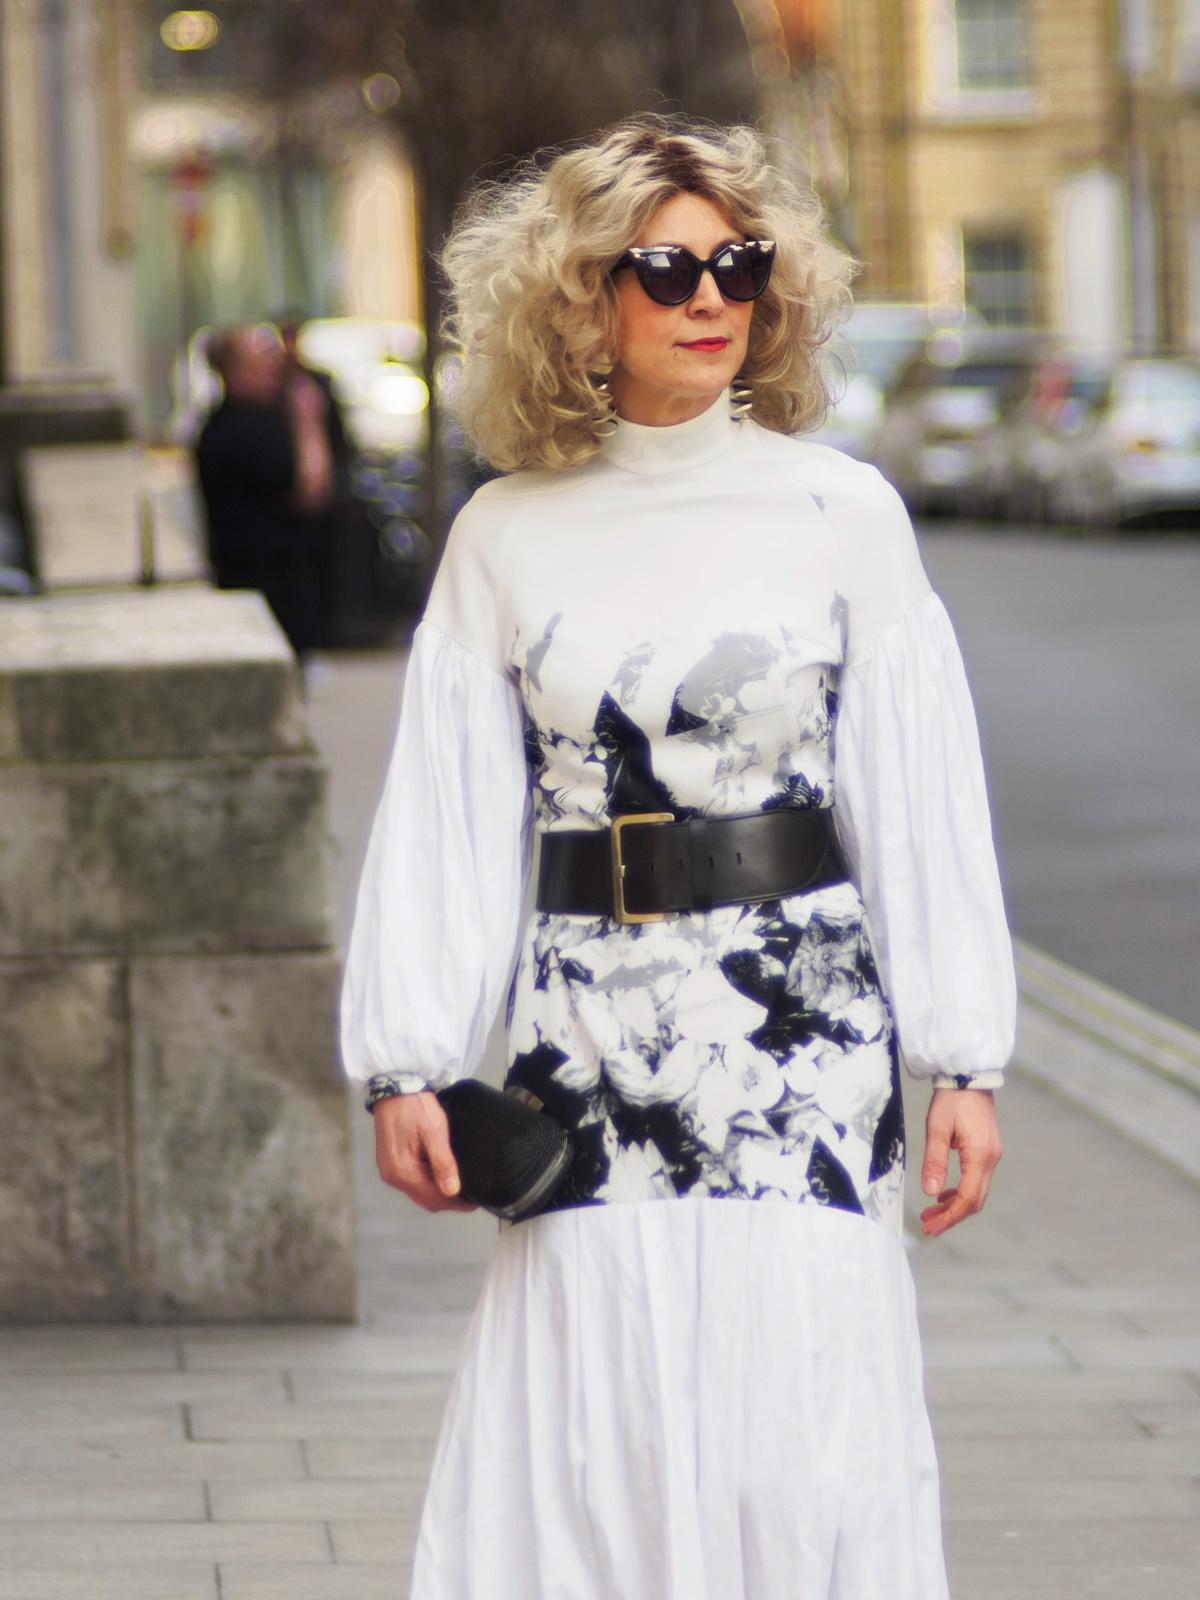 London Street style for British designer Brenda Lukwago during LFW Feb19 by Think Feel Discover